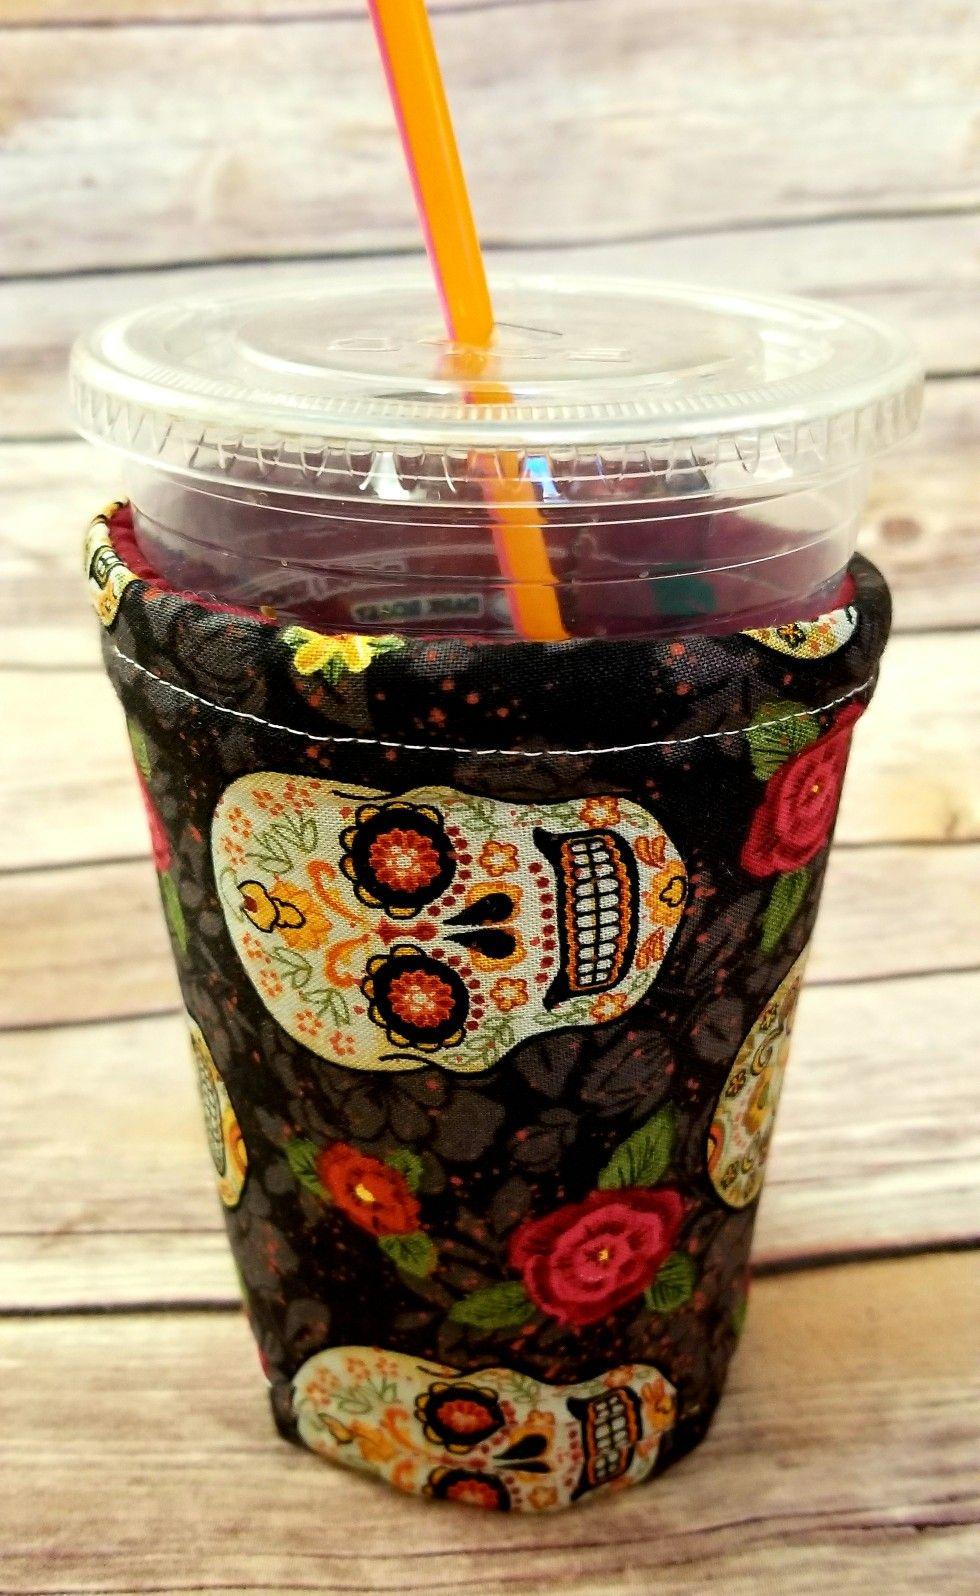 15 sugar skull w rose Ice coffee cozy visit